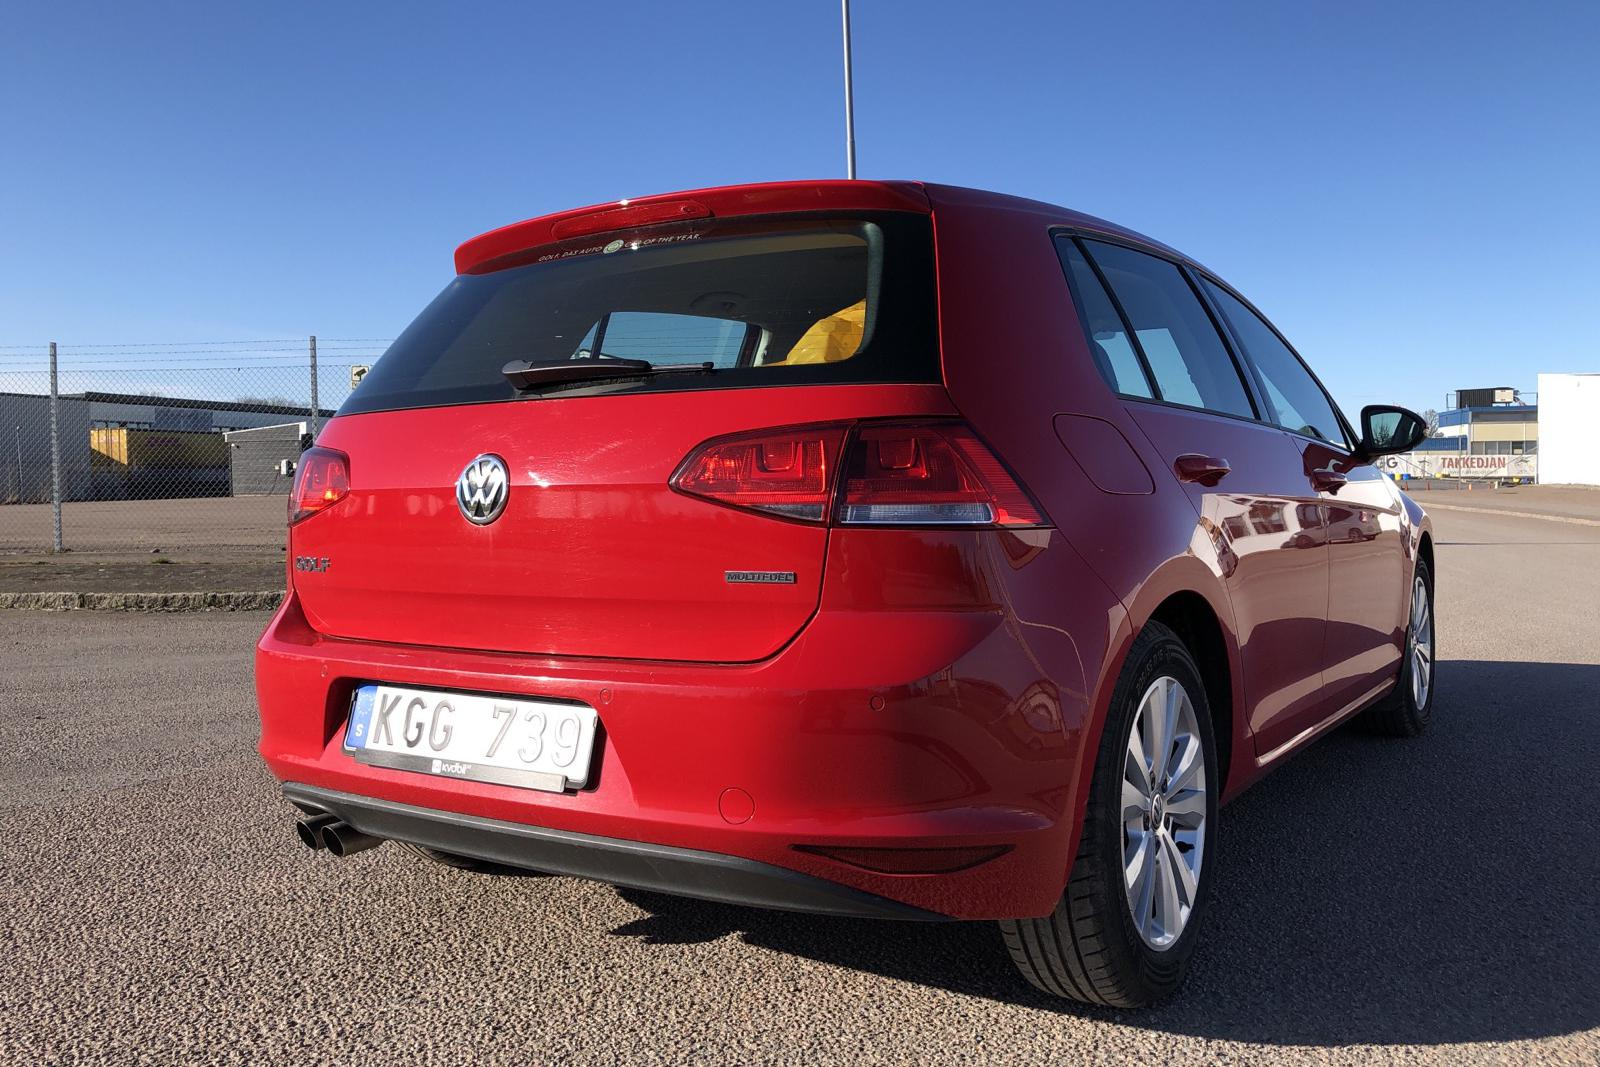 VW Golf VII 1.4 TSI Multifuel 5dr (122hk) - 57 190 km - Manual - red - 2014